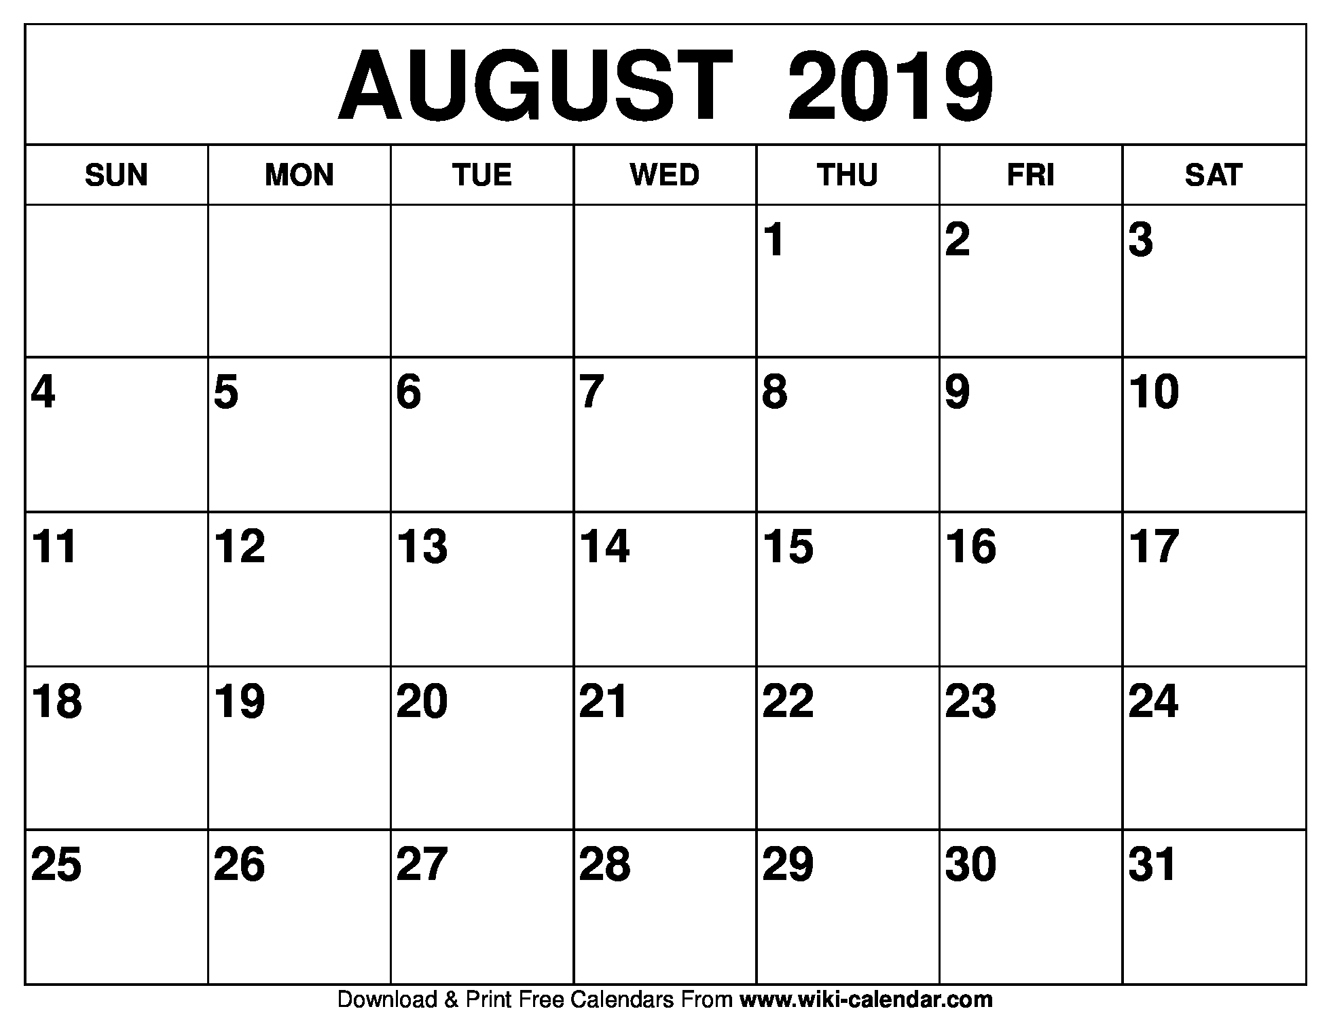 Blank August 2019 Calendar Printable regarding Pretty Blank Augst Calender